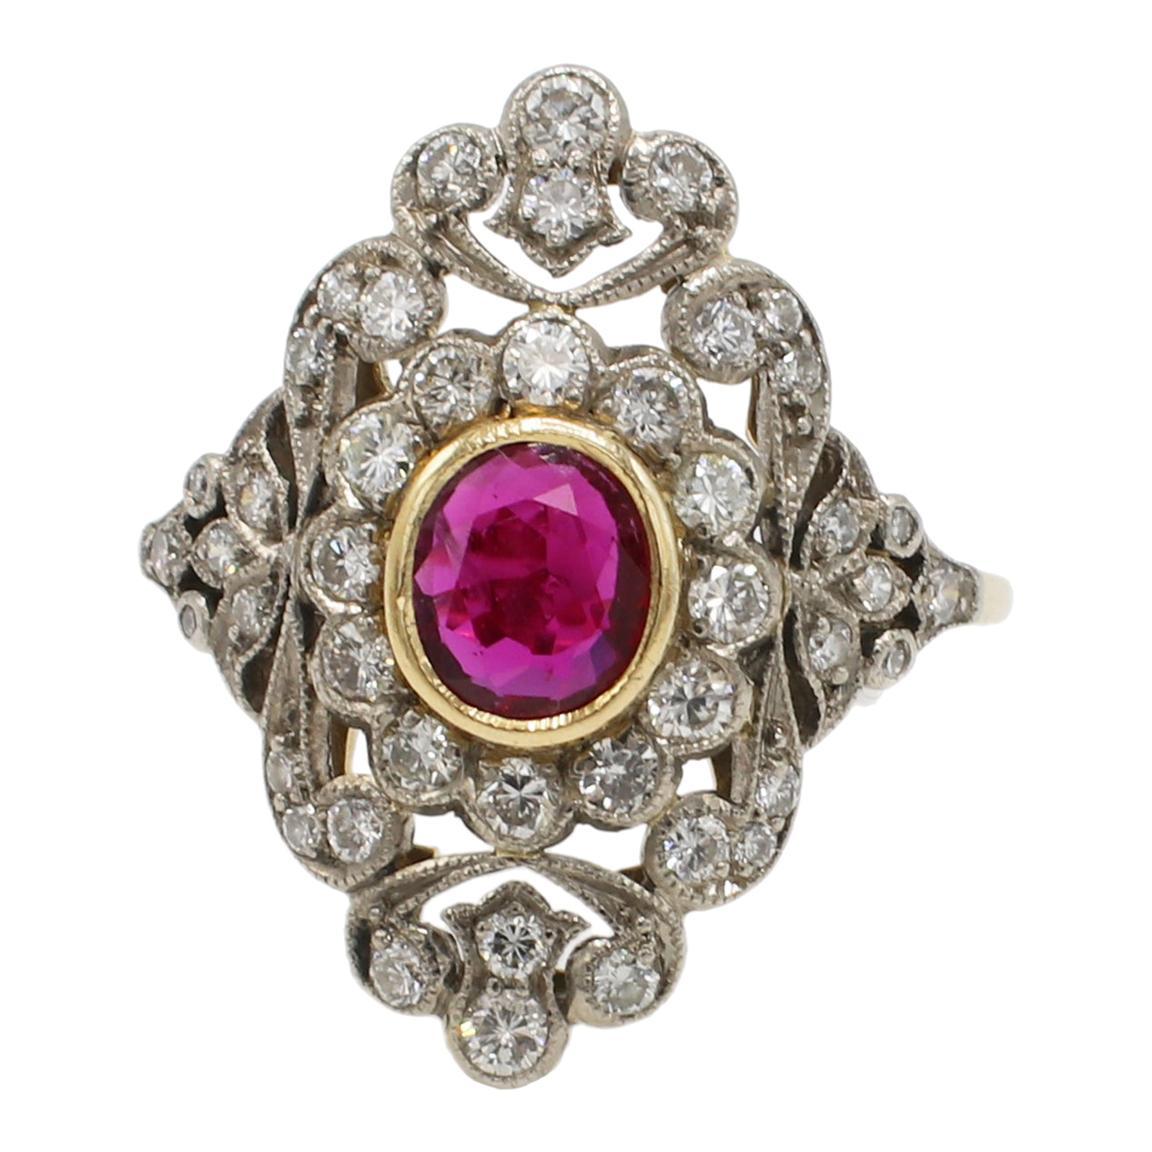 18 Karat & Platinum Ruby and Diamond Filigree Cocktail Ring